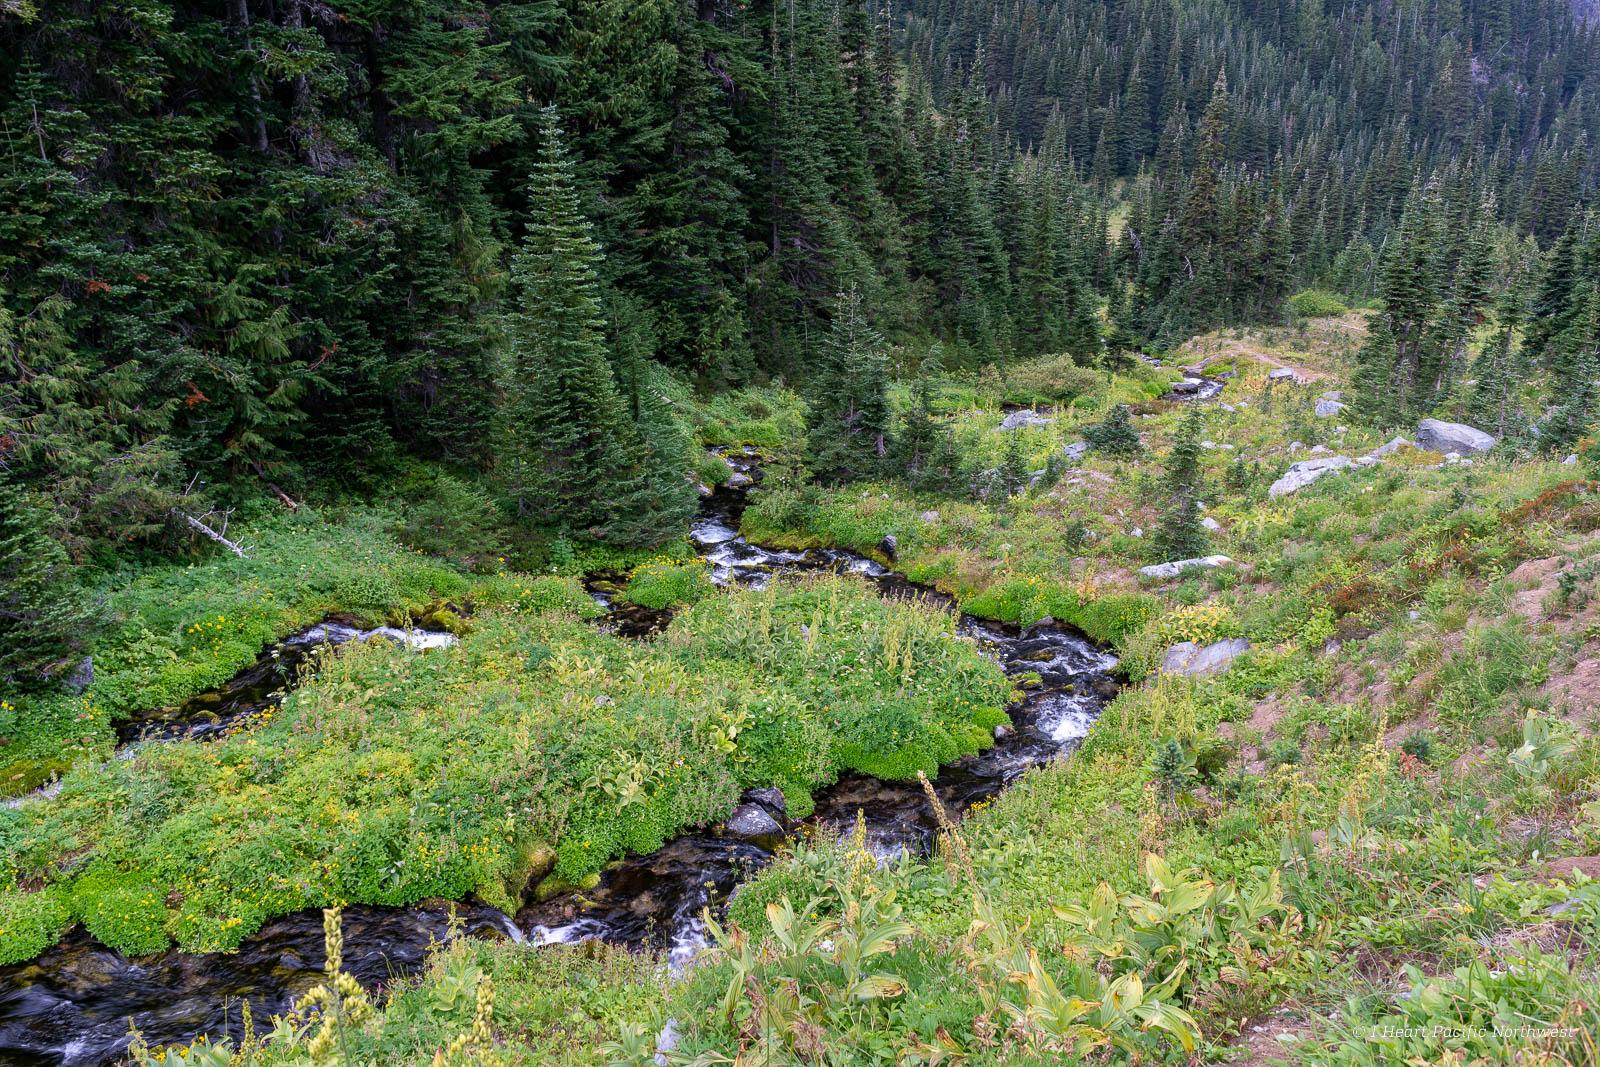 Mount Rainier - Berkeley Park backpacking trip